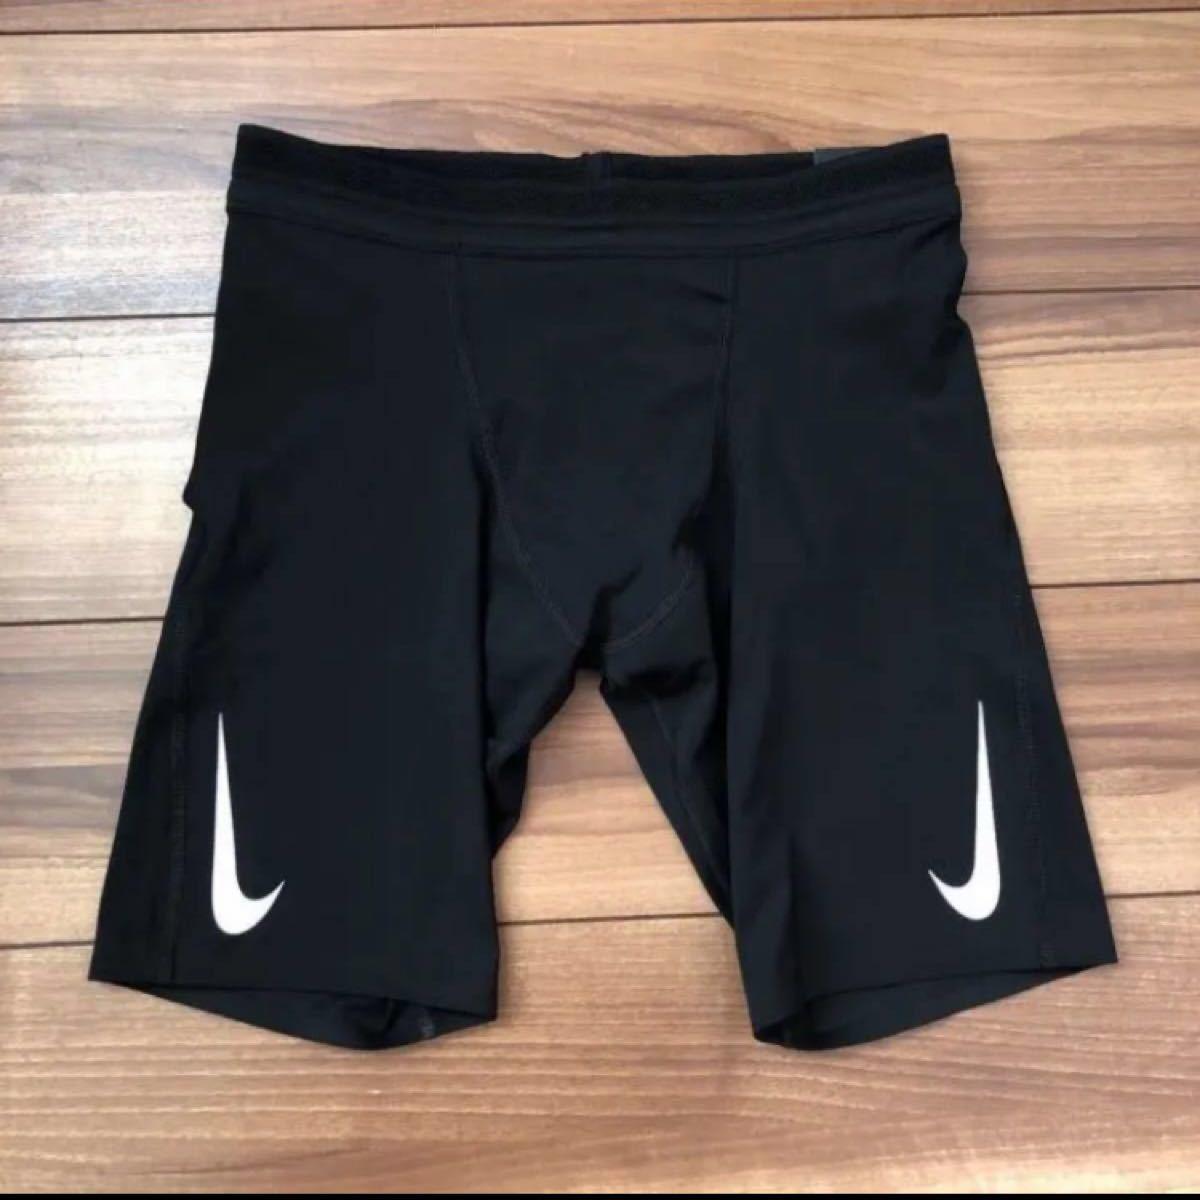 Nike ナイキ エアロスイフト ランニング タイツ XL 大迫着用